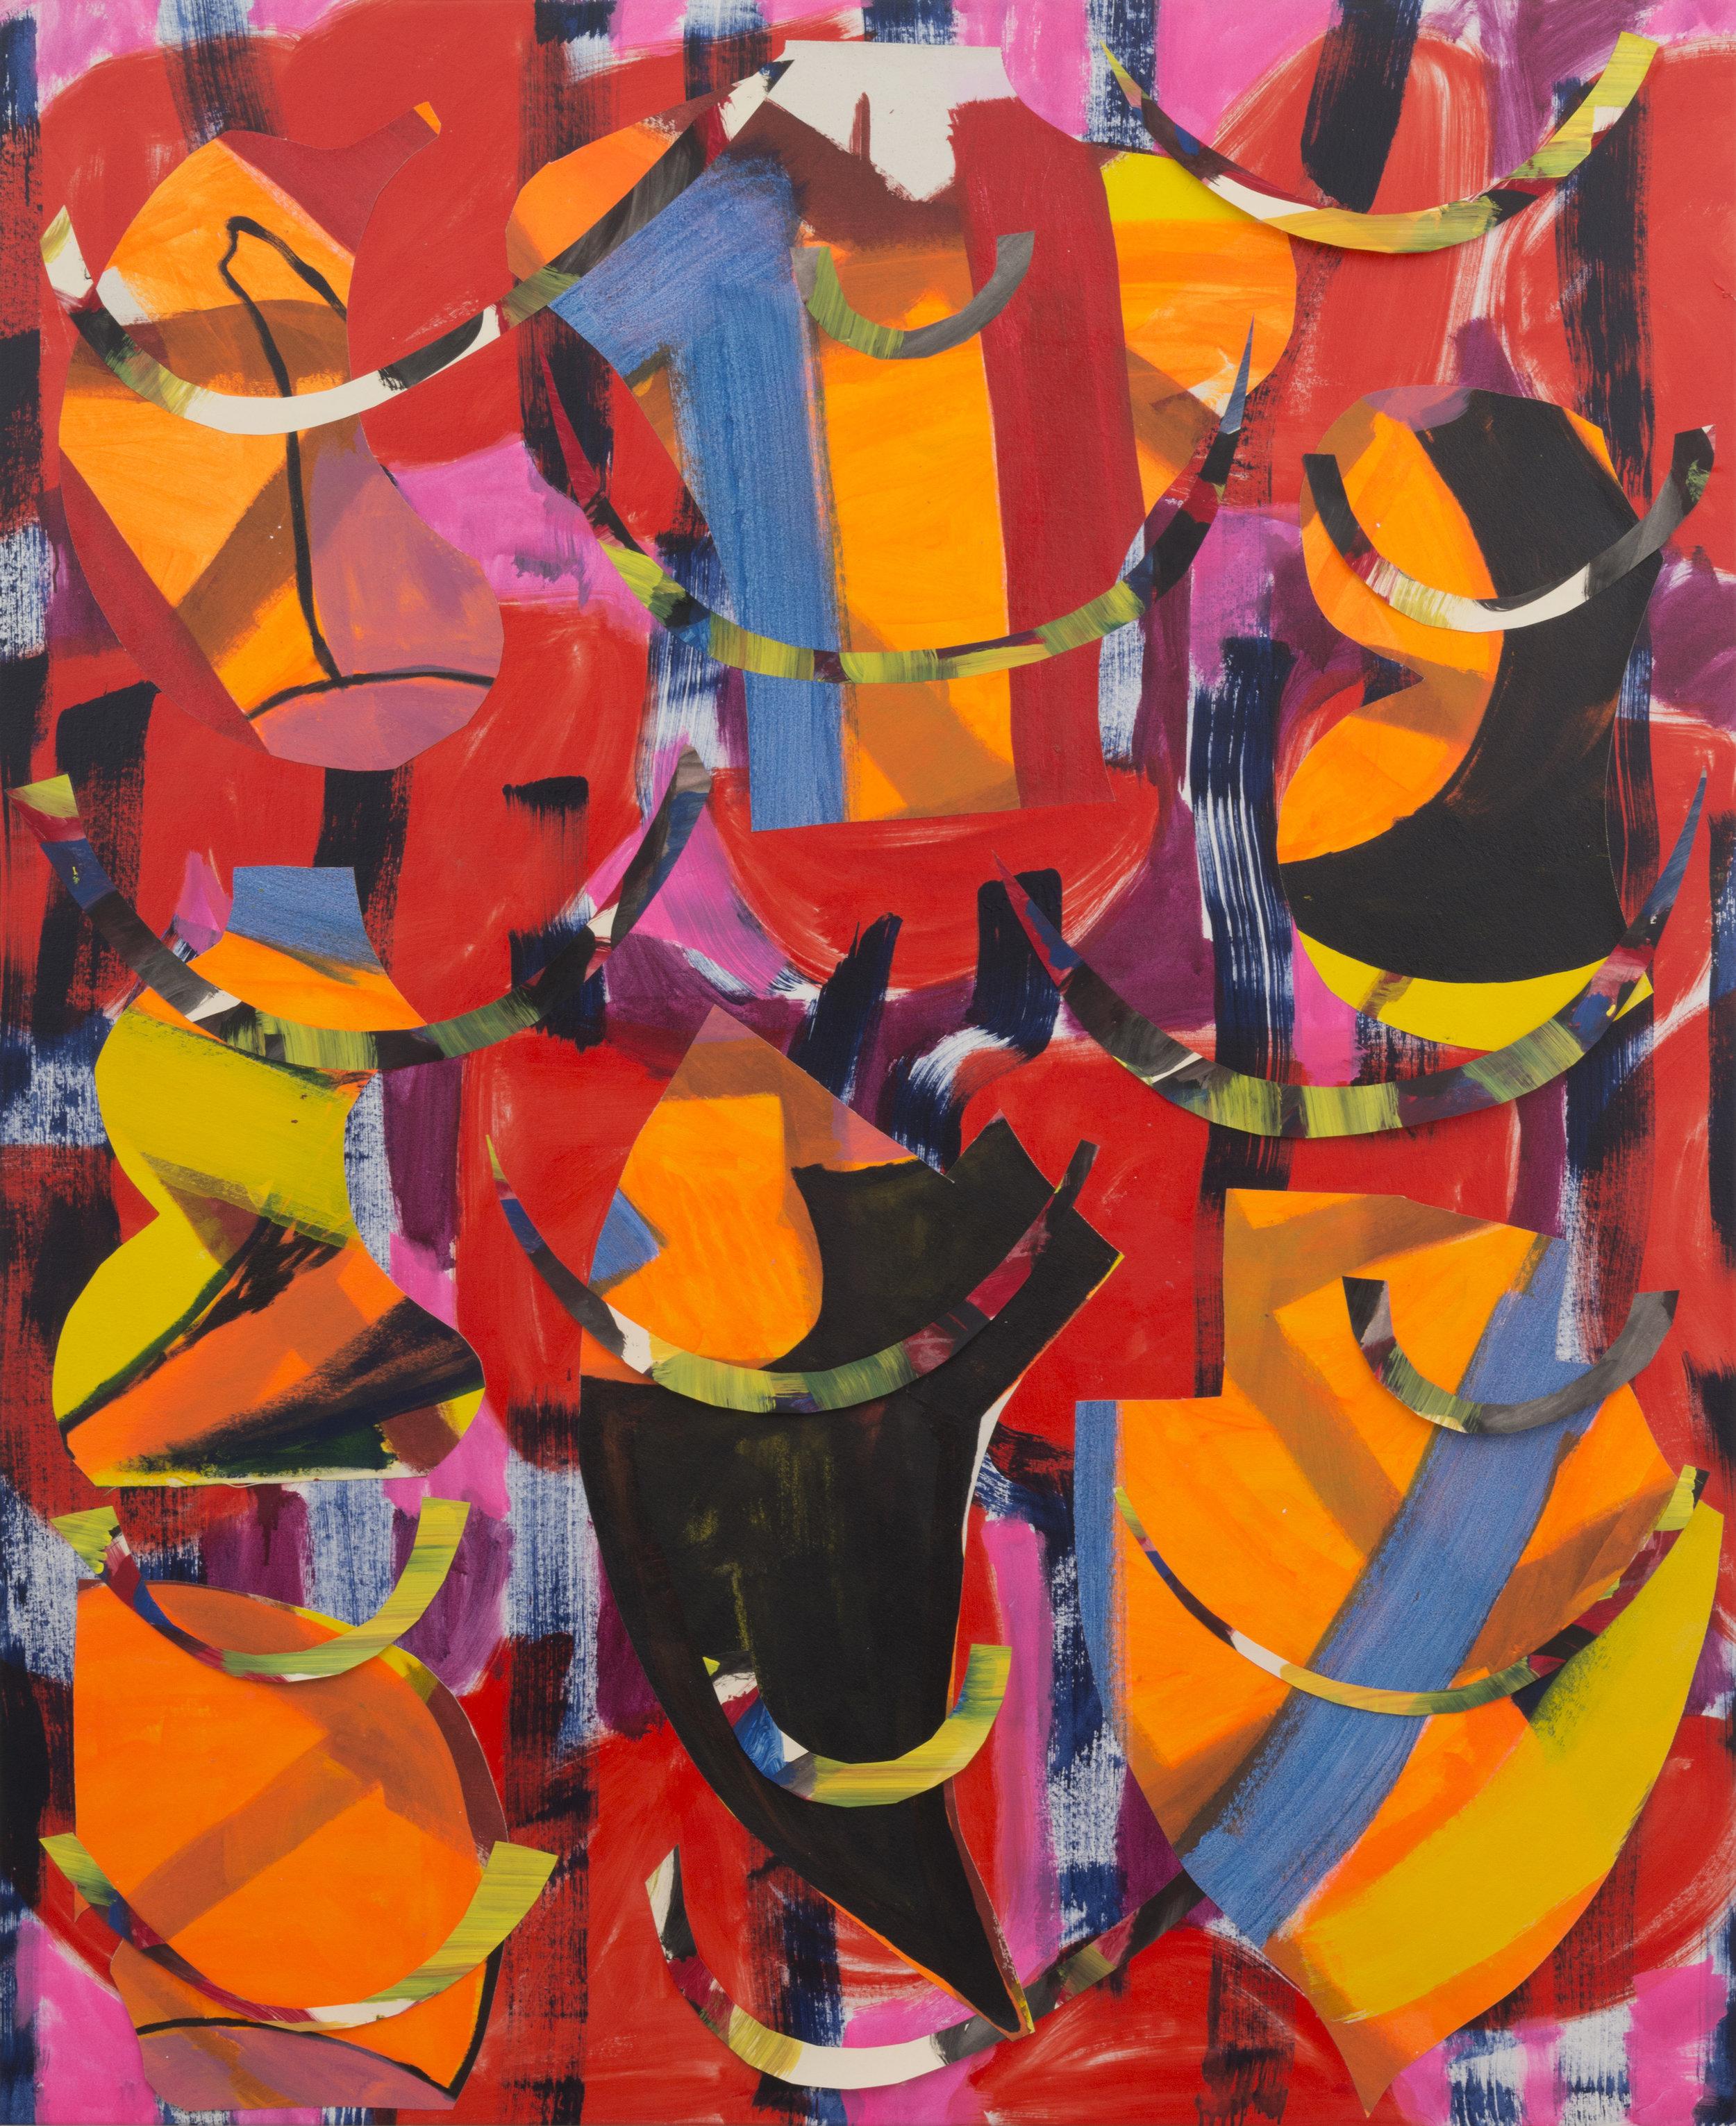 August 21, 2016 / Acrylic, Glue, Canvas / 83 x 68 1/2 inches